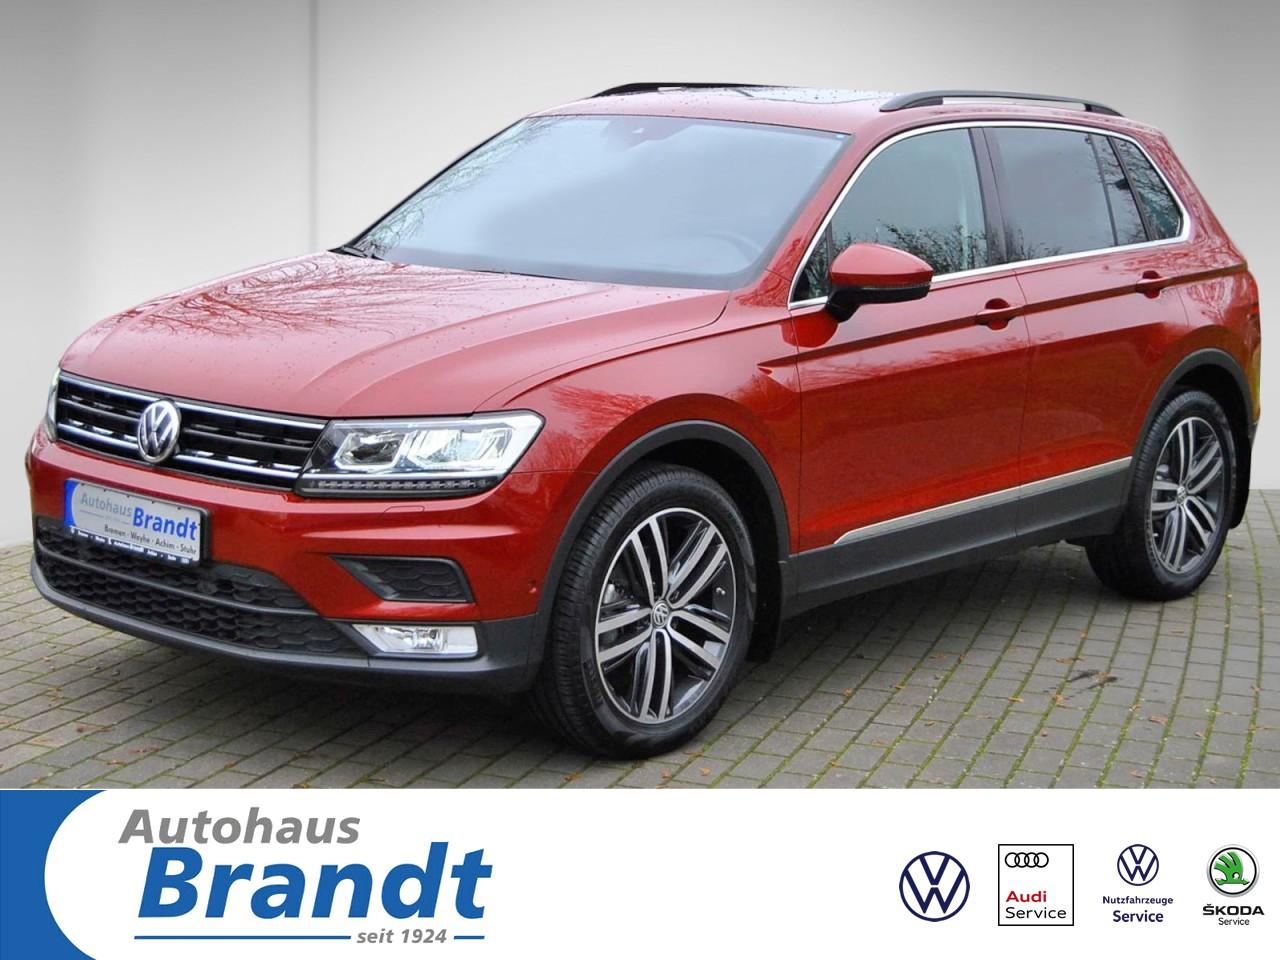 Volkswagen Tiguan 1.4 TSI LED*NAVI*ACC*KAMERA*PANO*SHZ, Jahr 2016, Benzin